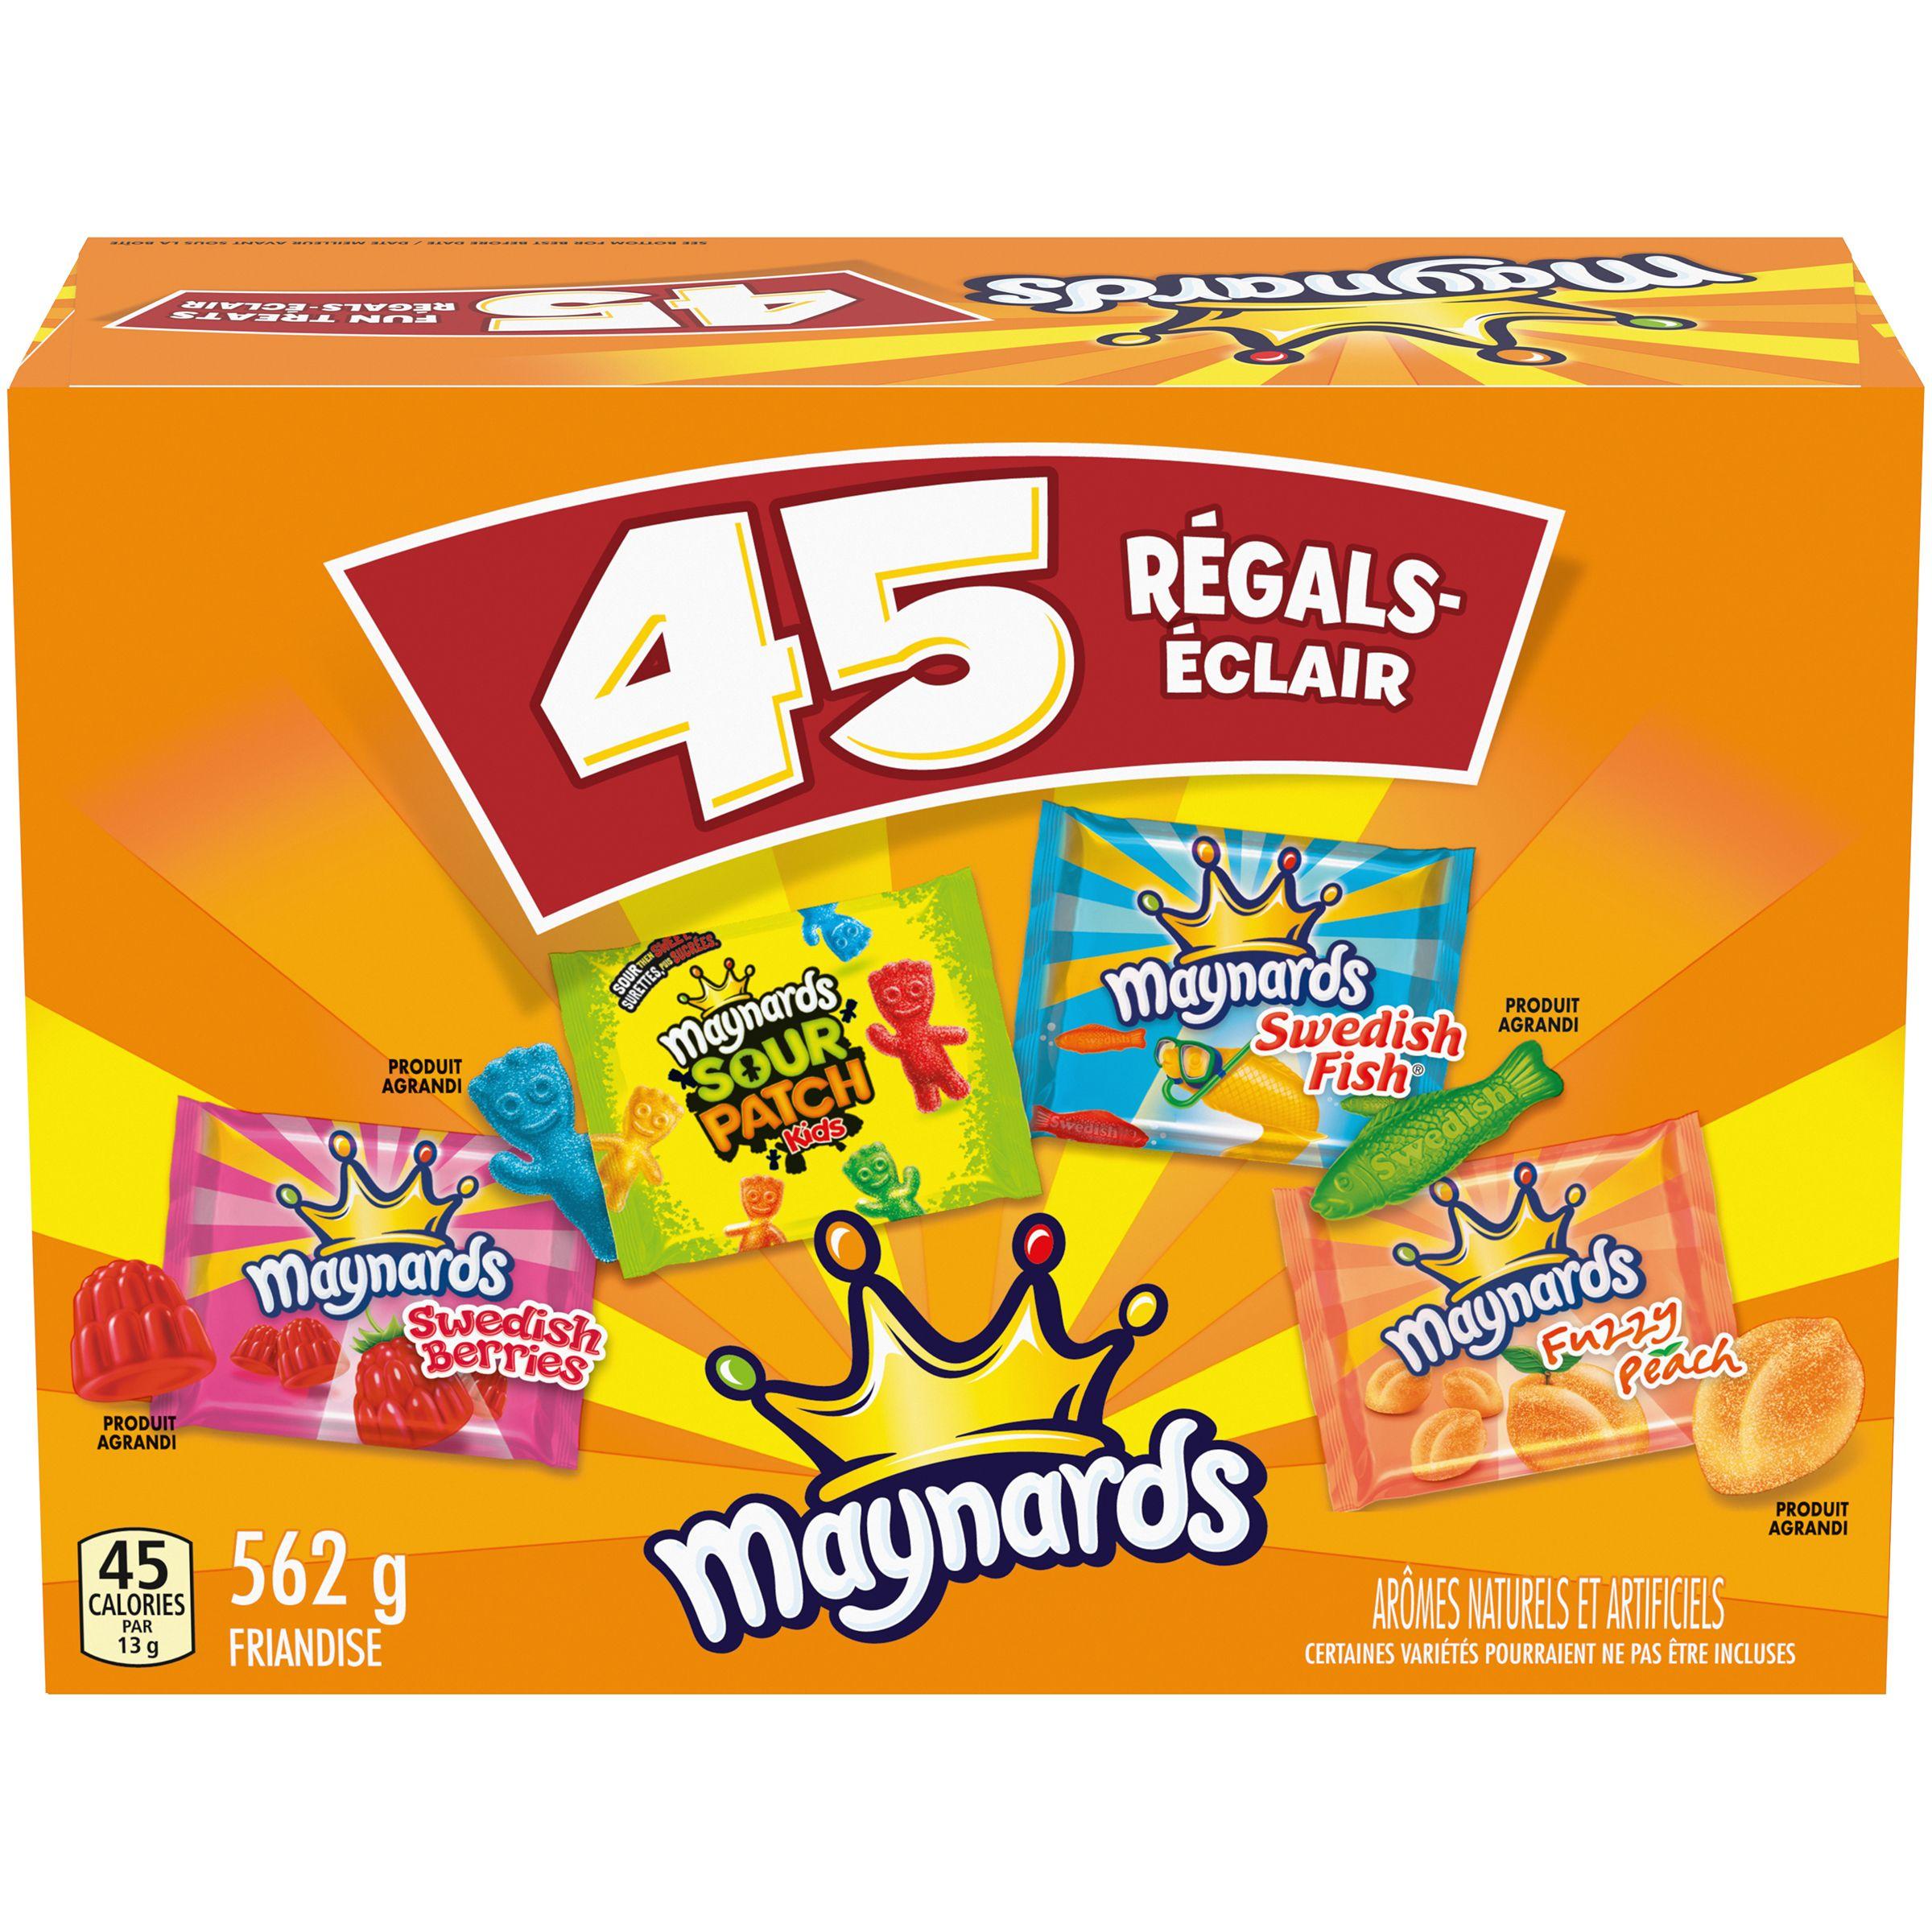 Maynards Crossbrands Fun Treats Soft Candy G